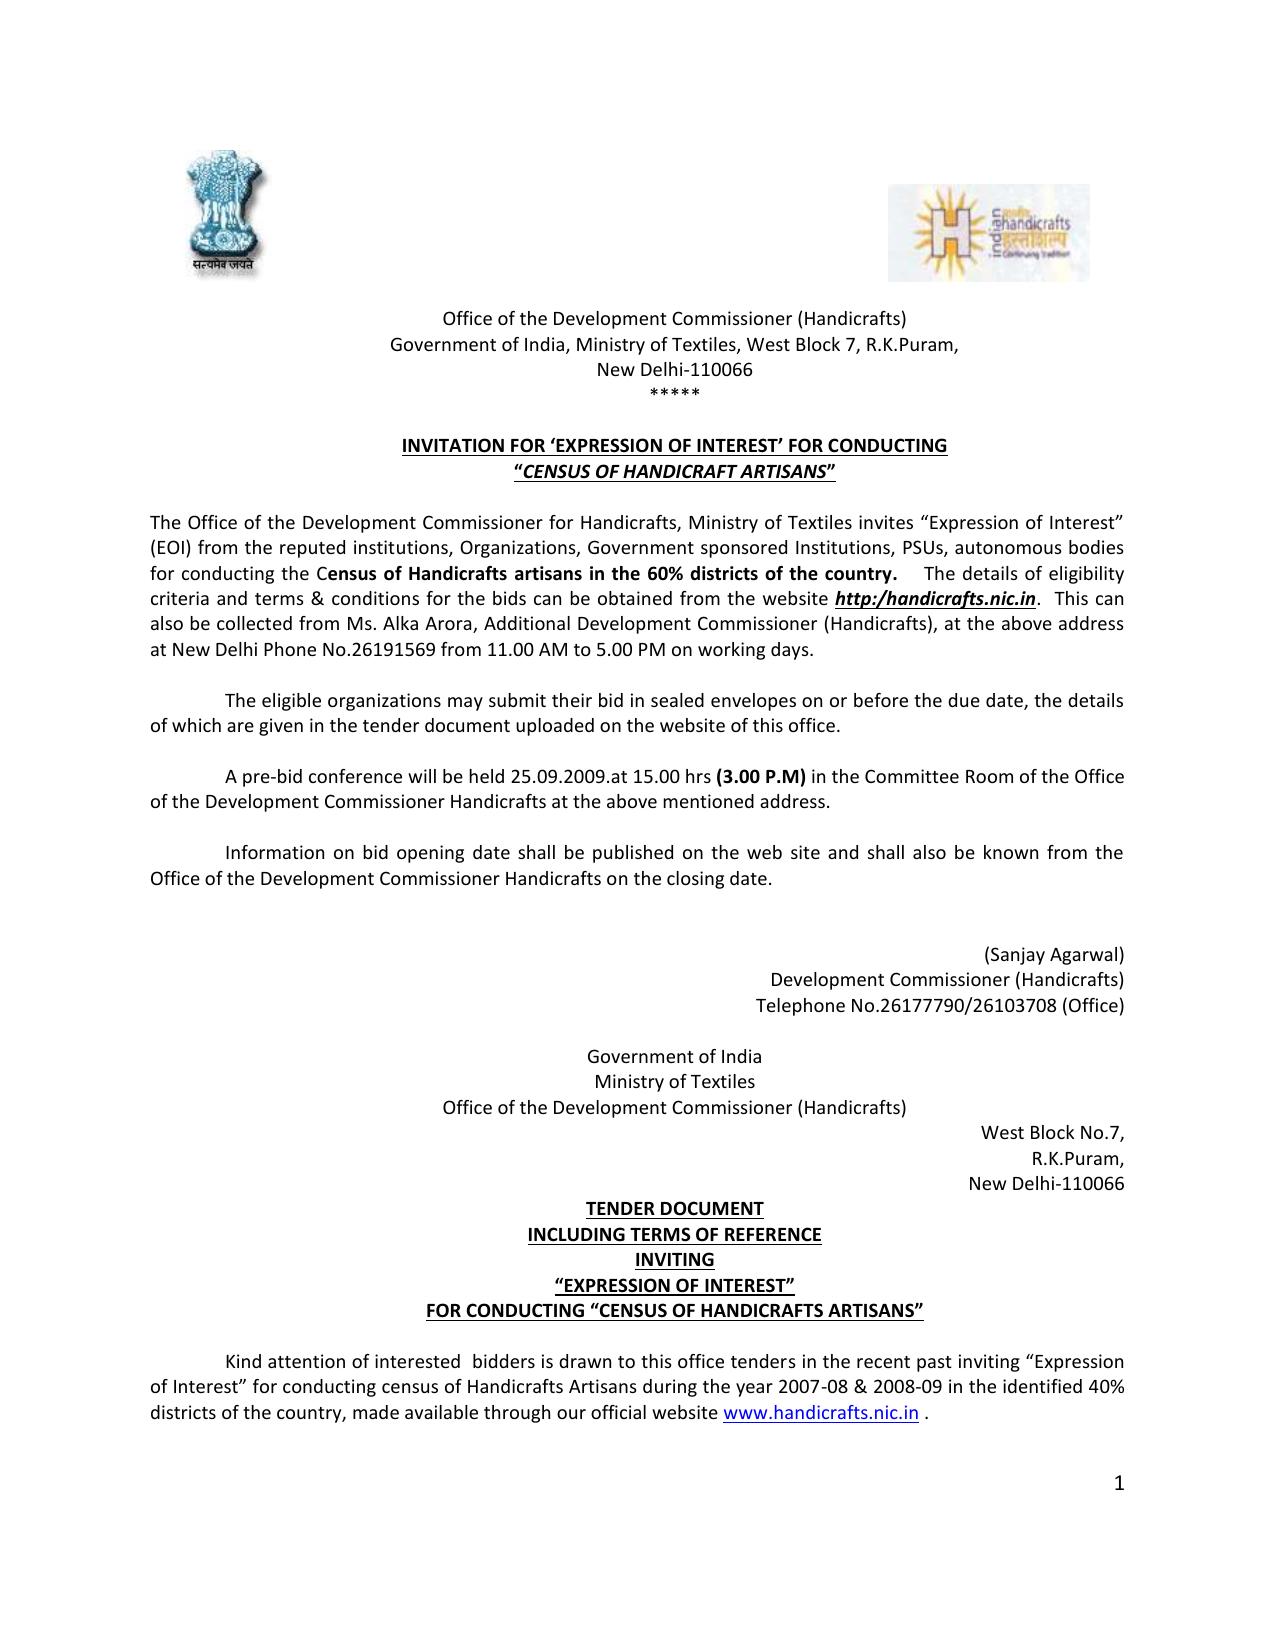 Census For Handicrafts Artisans Development Commissioner For